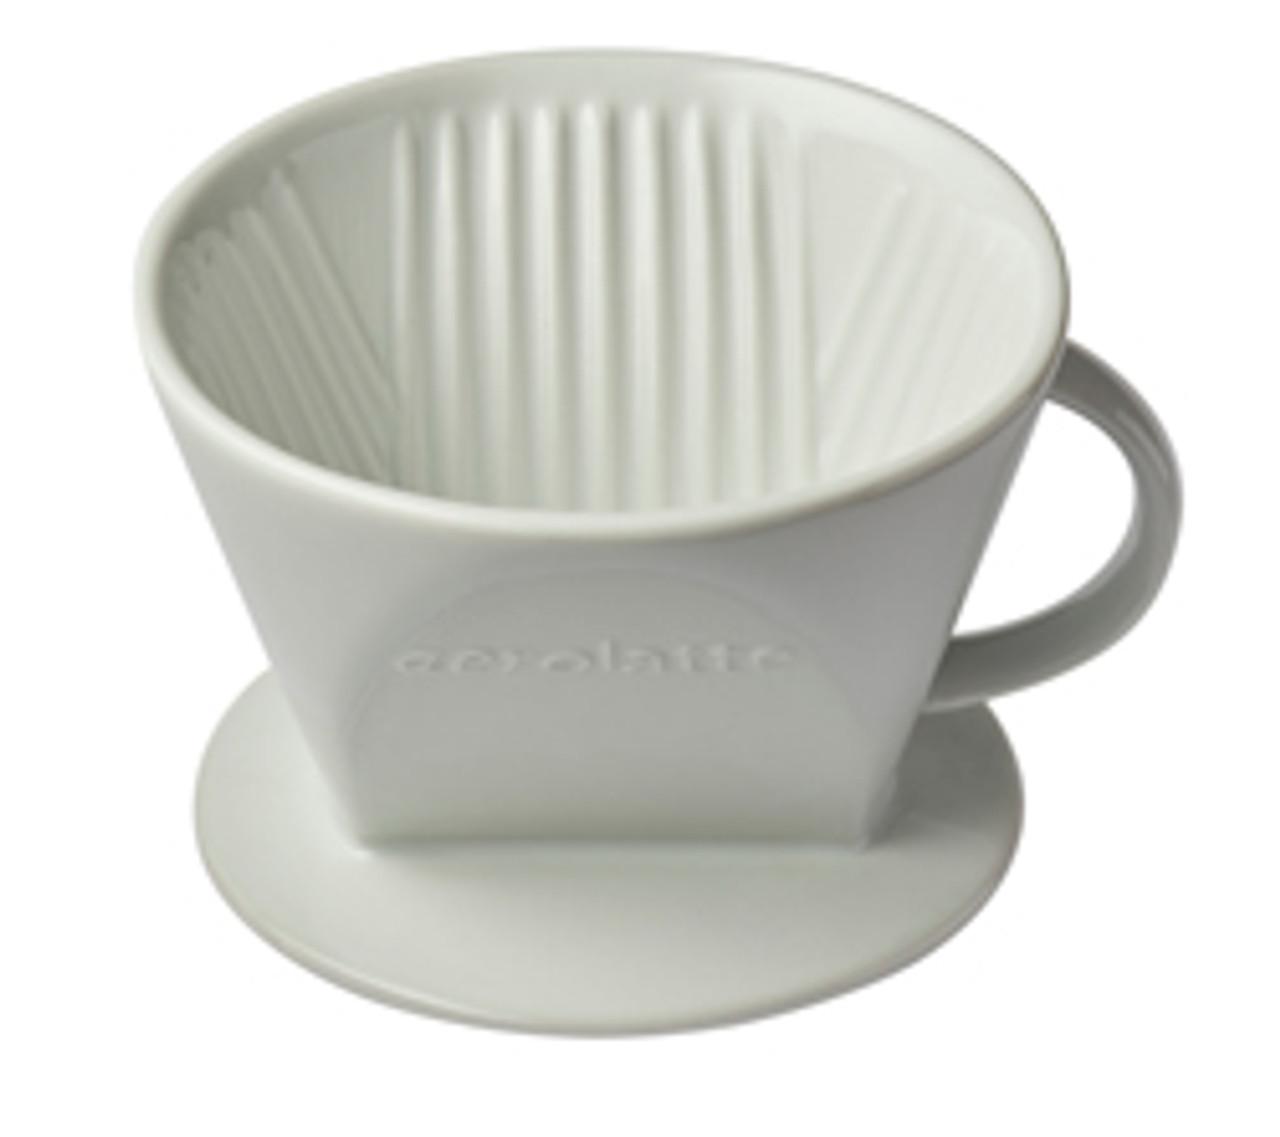 Aerolatte Ceramic Coffee Filter Cone, 4 Cup